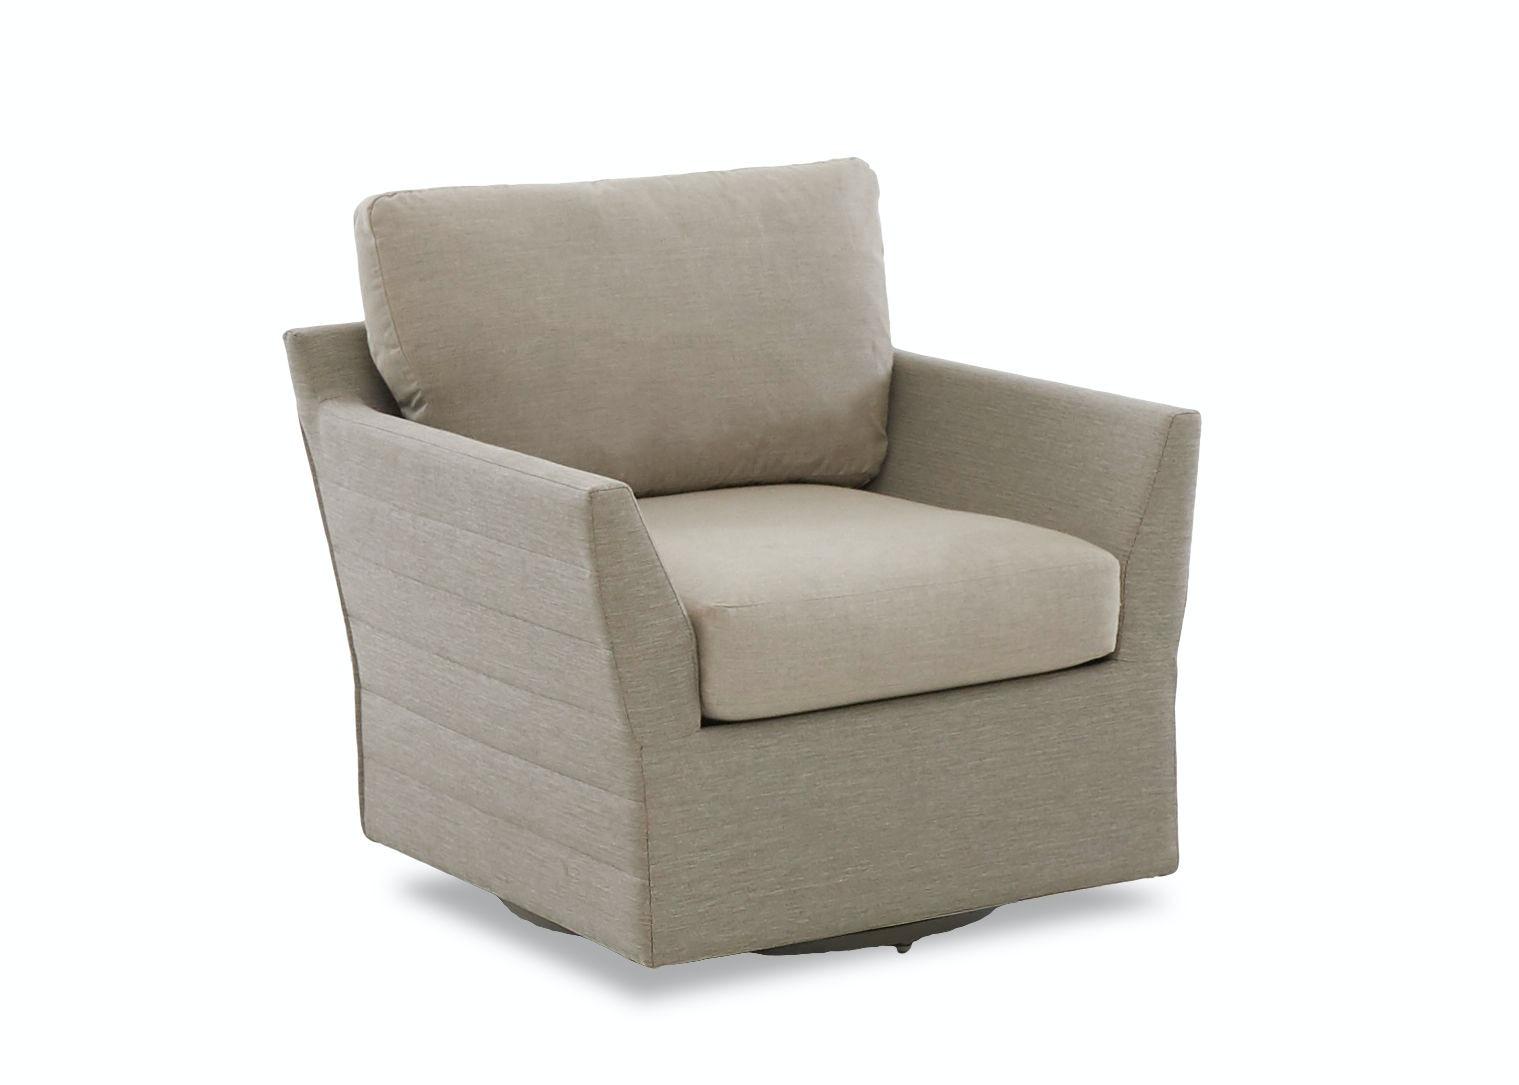 Genial Carolina Preserves Outdoor/Patio Urban Retreat Chair W3500 SWVL At Furniture  Kingdom